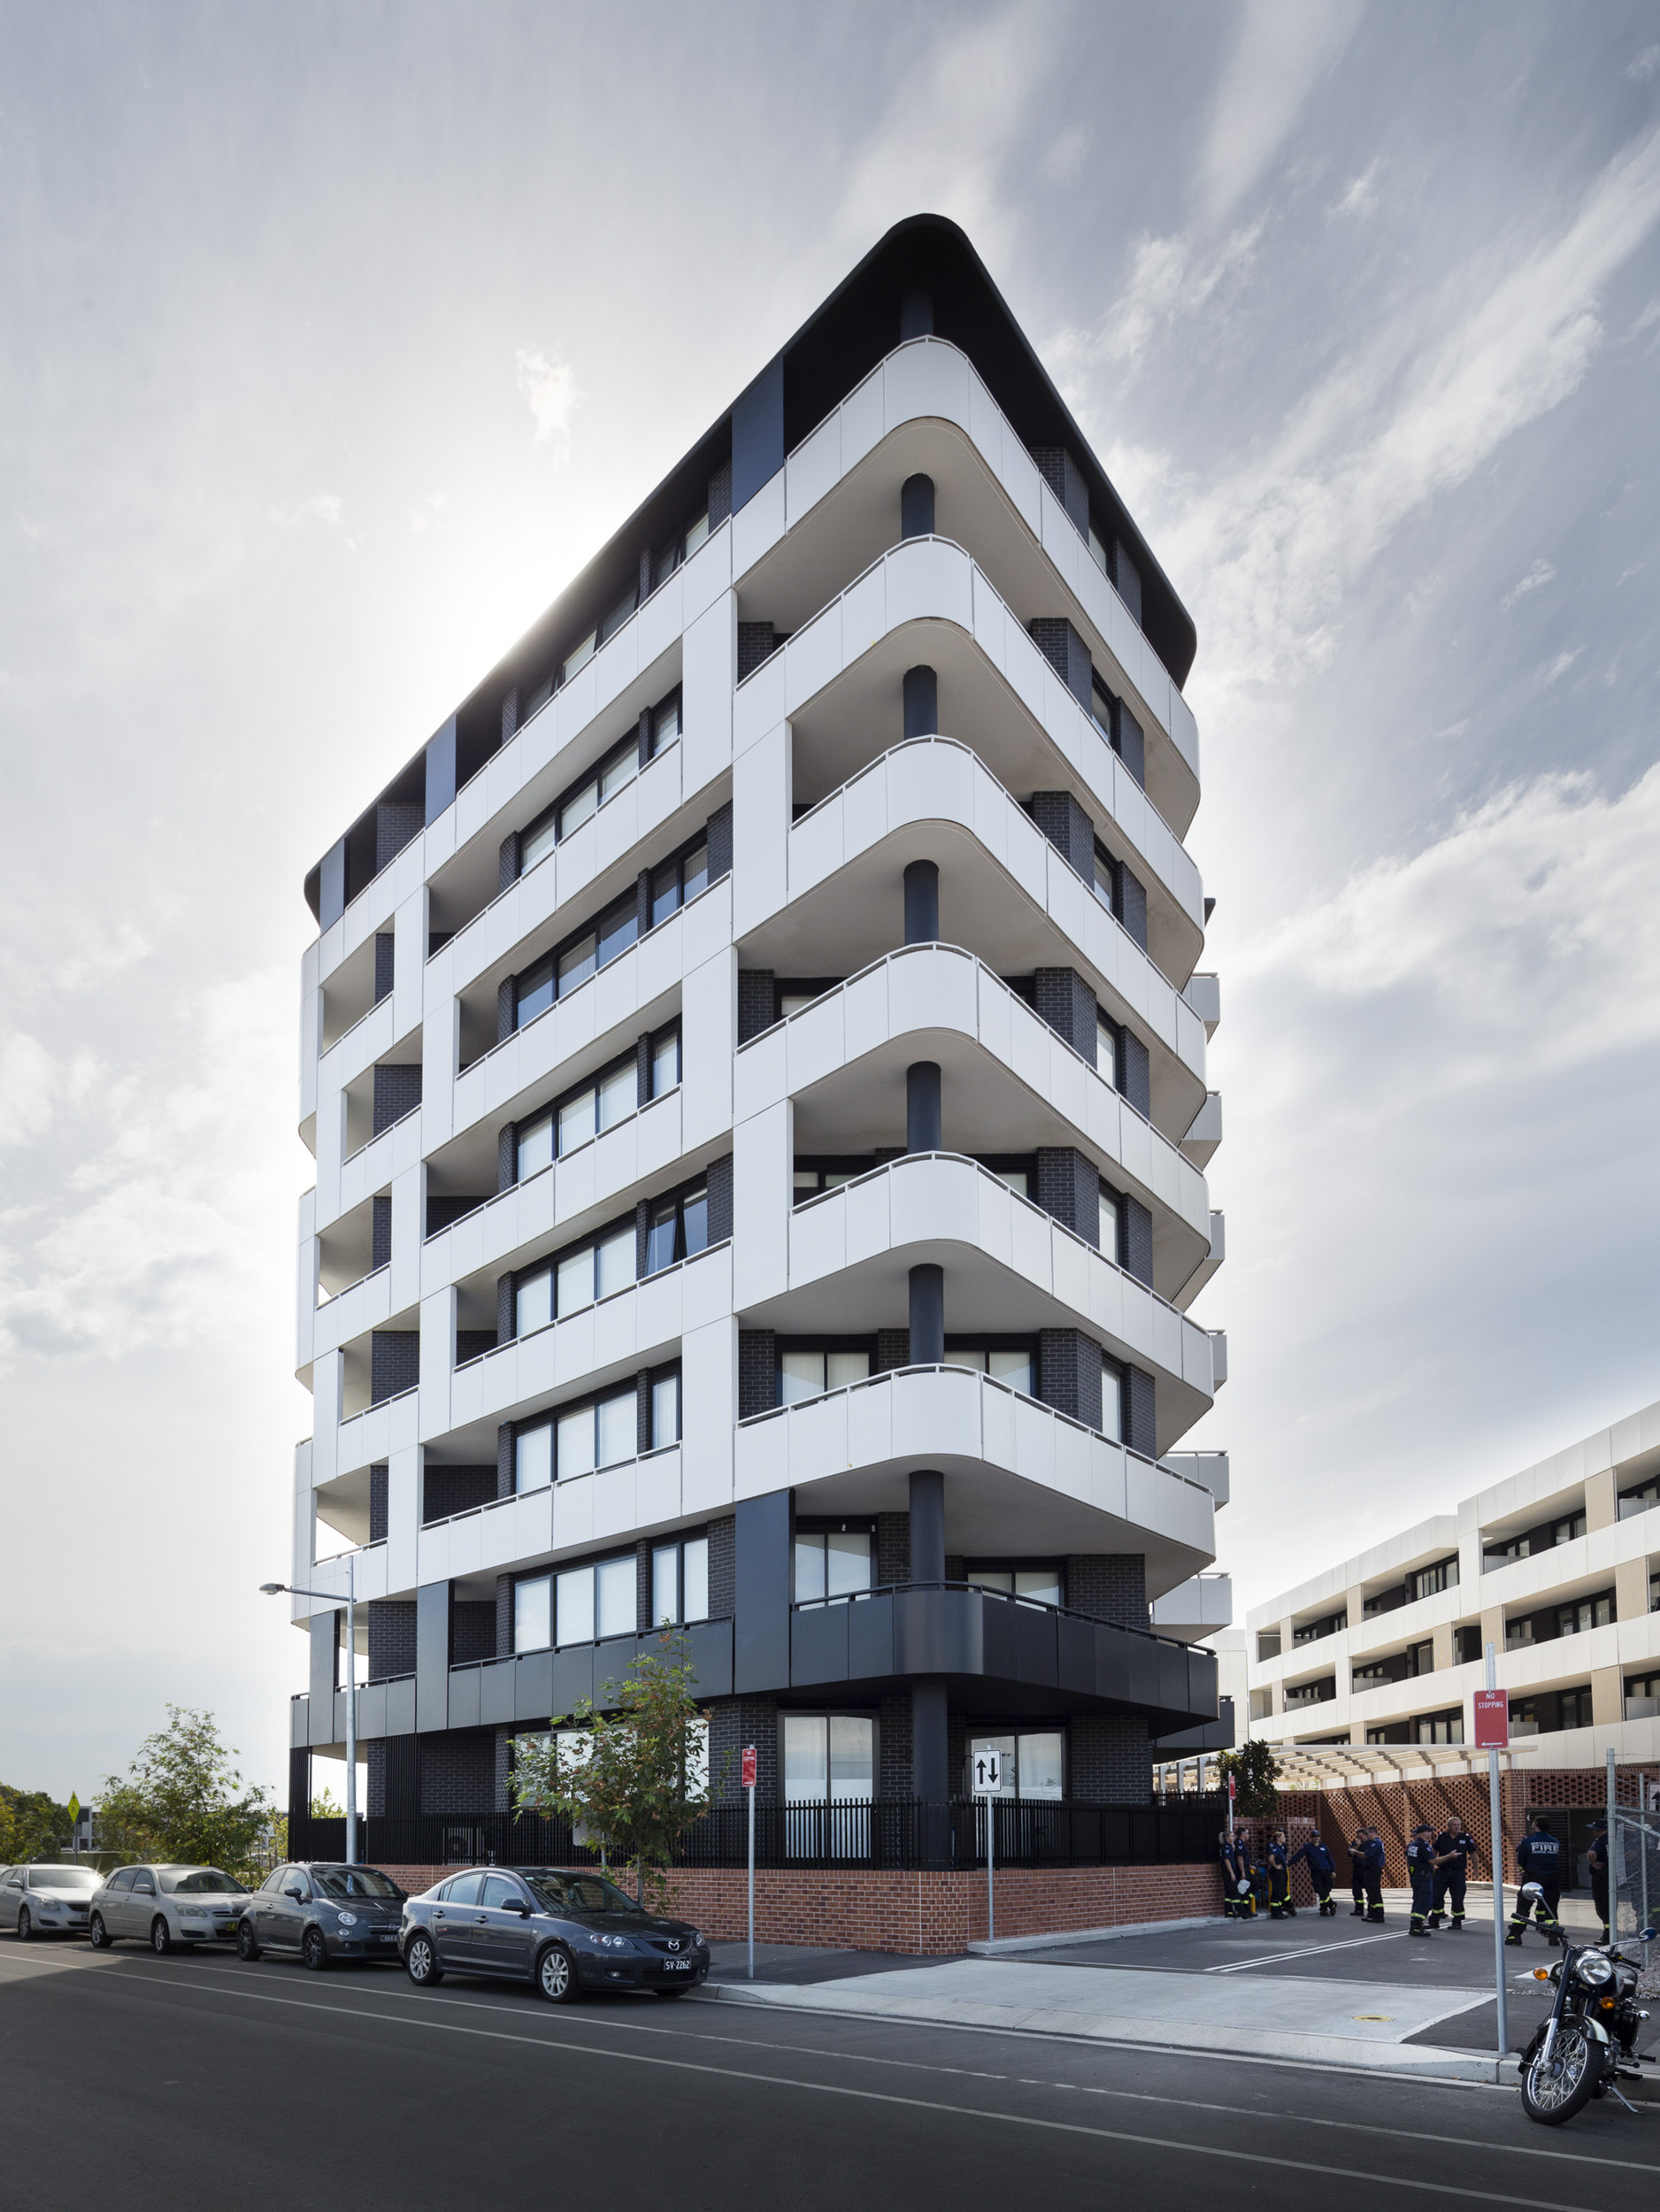 architecture_photography_sydney_australia_30.jpg